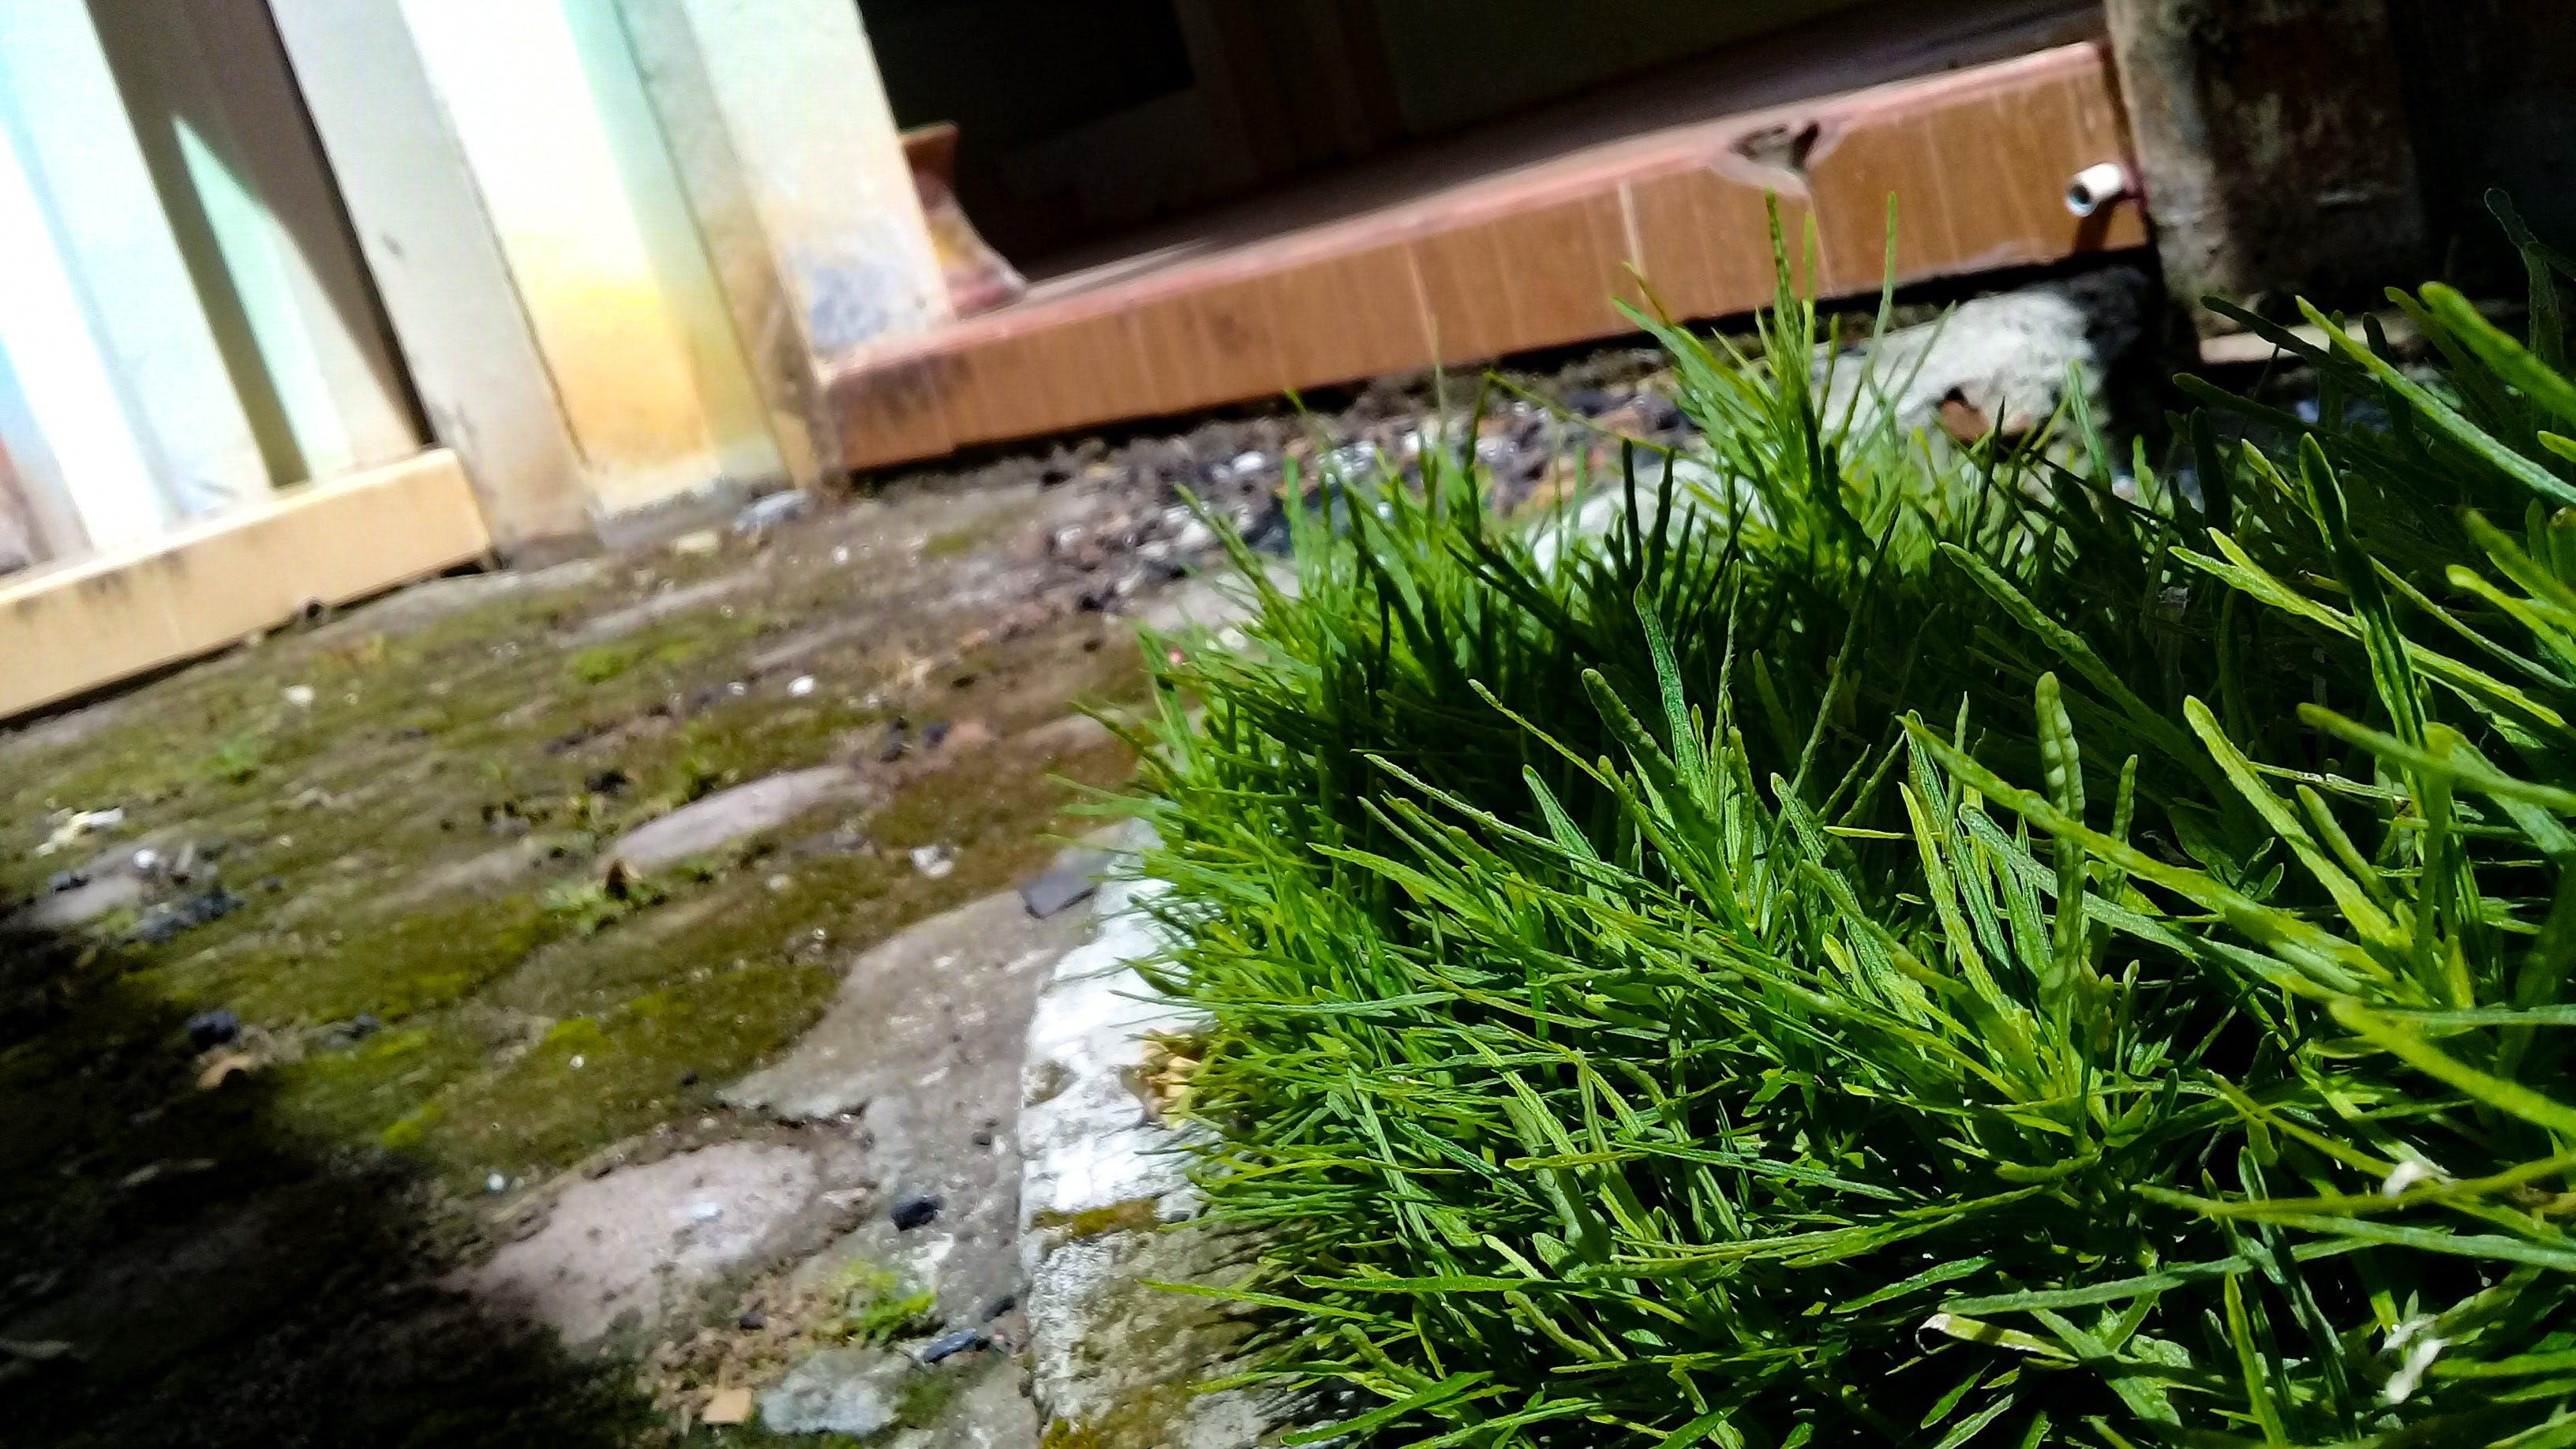 Free stock photo of blur, blurred background, grass, green grass